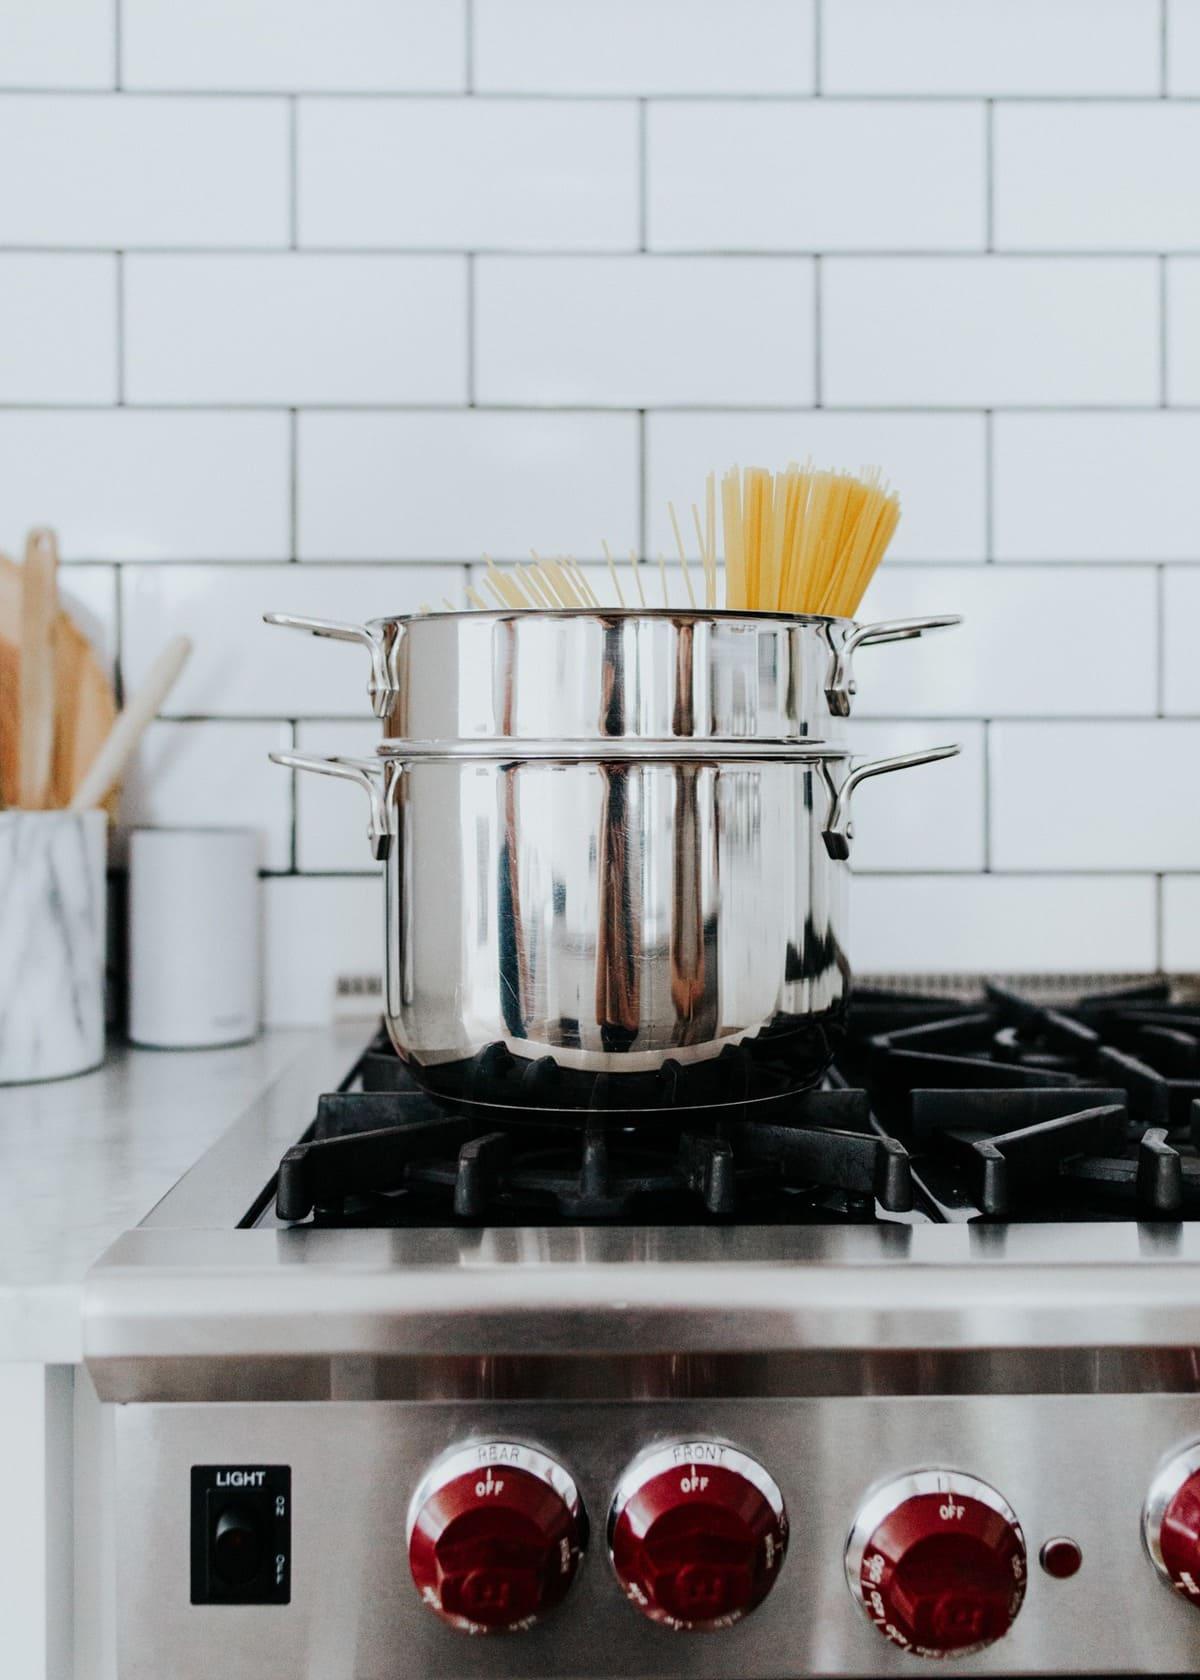 all-clad pasta pot with colander